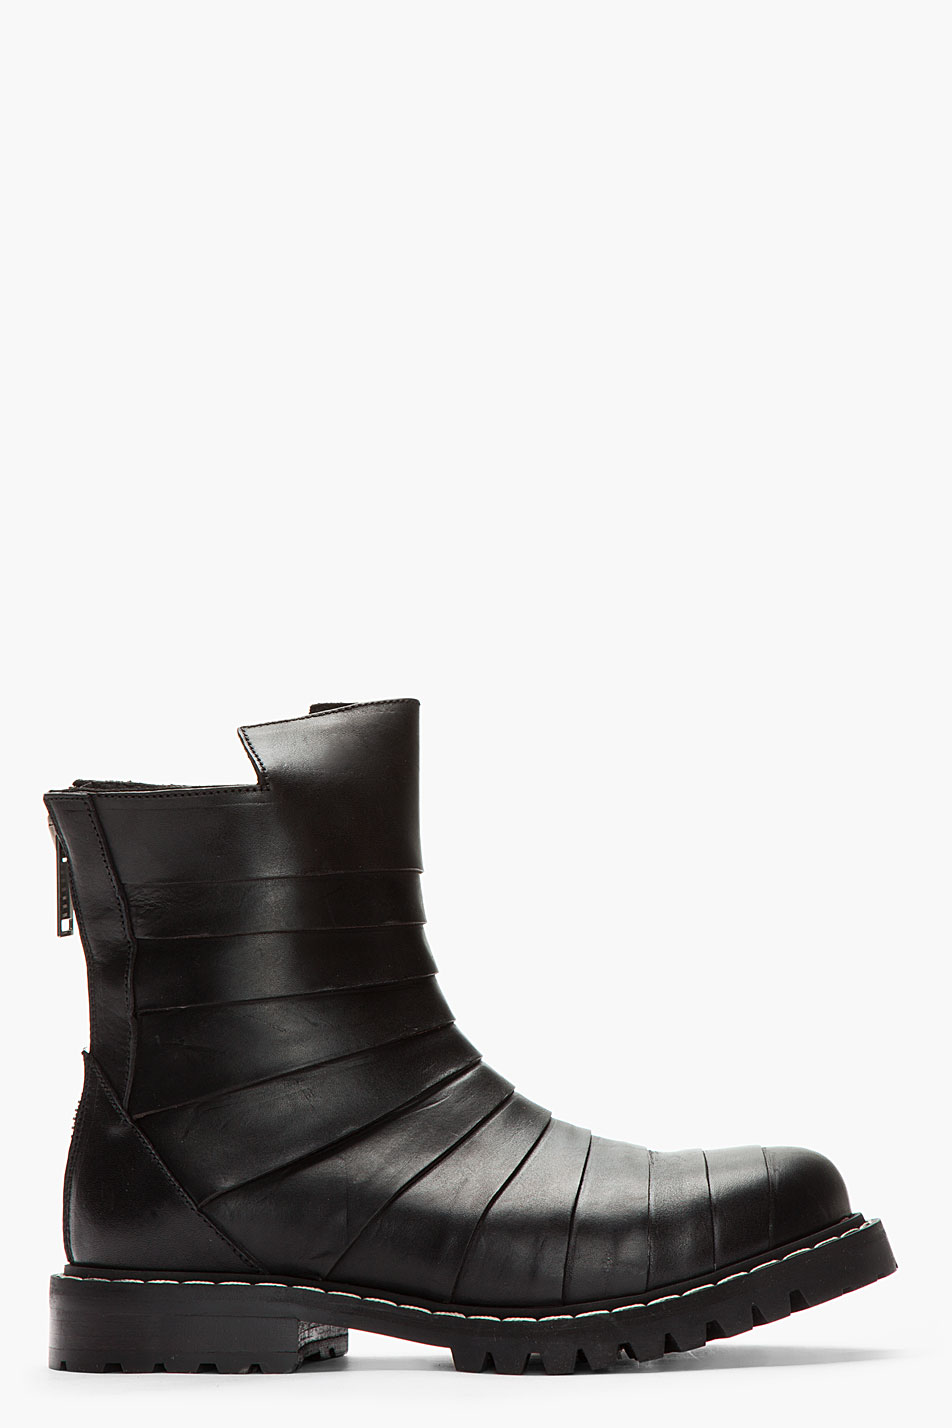 gareth pugh paneled leather cutout biker boots in black